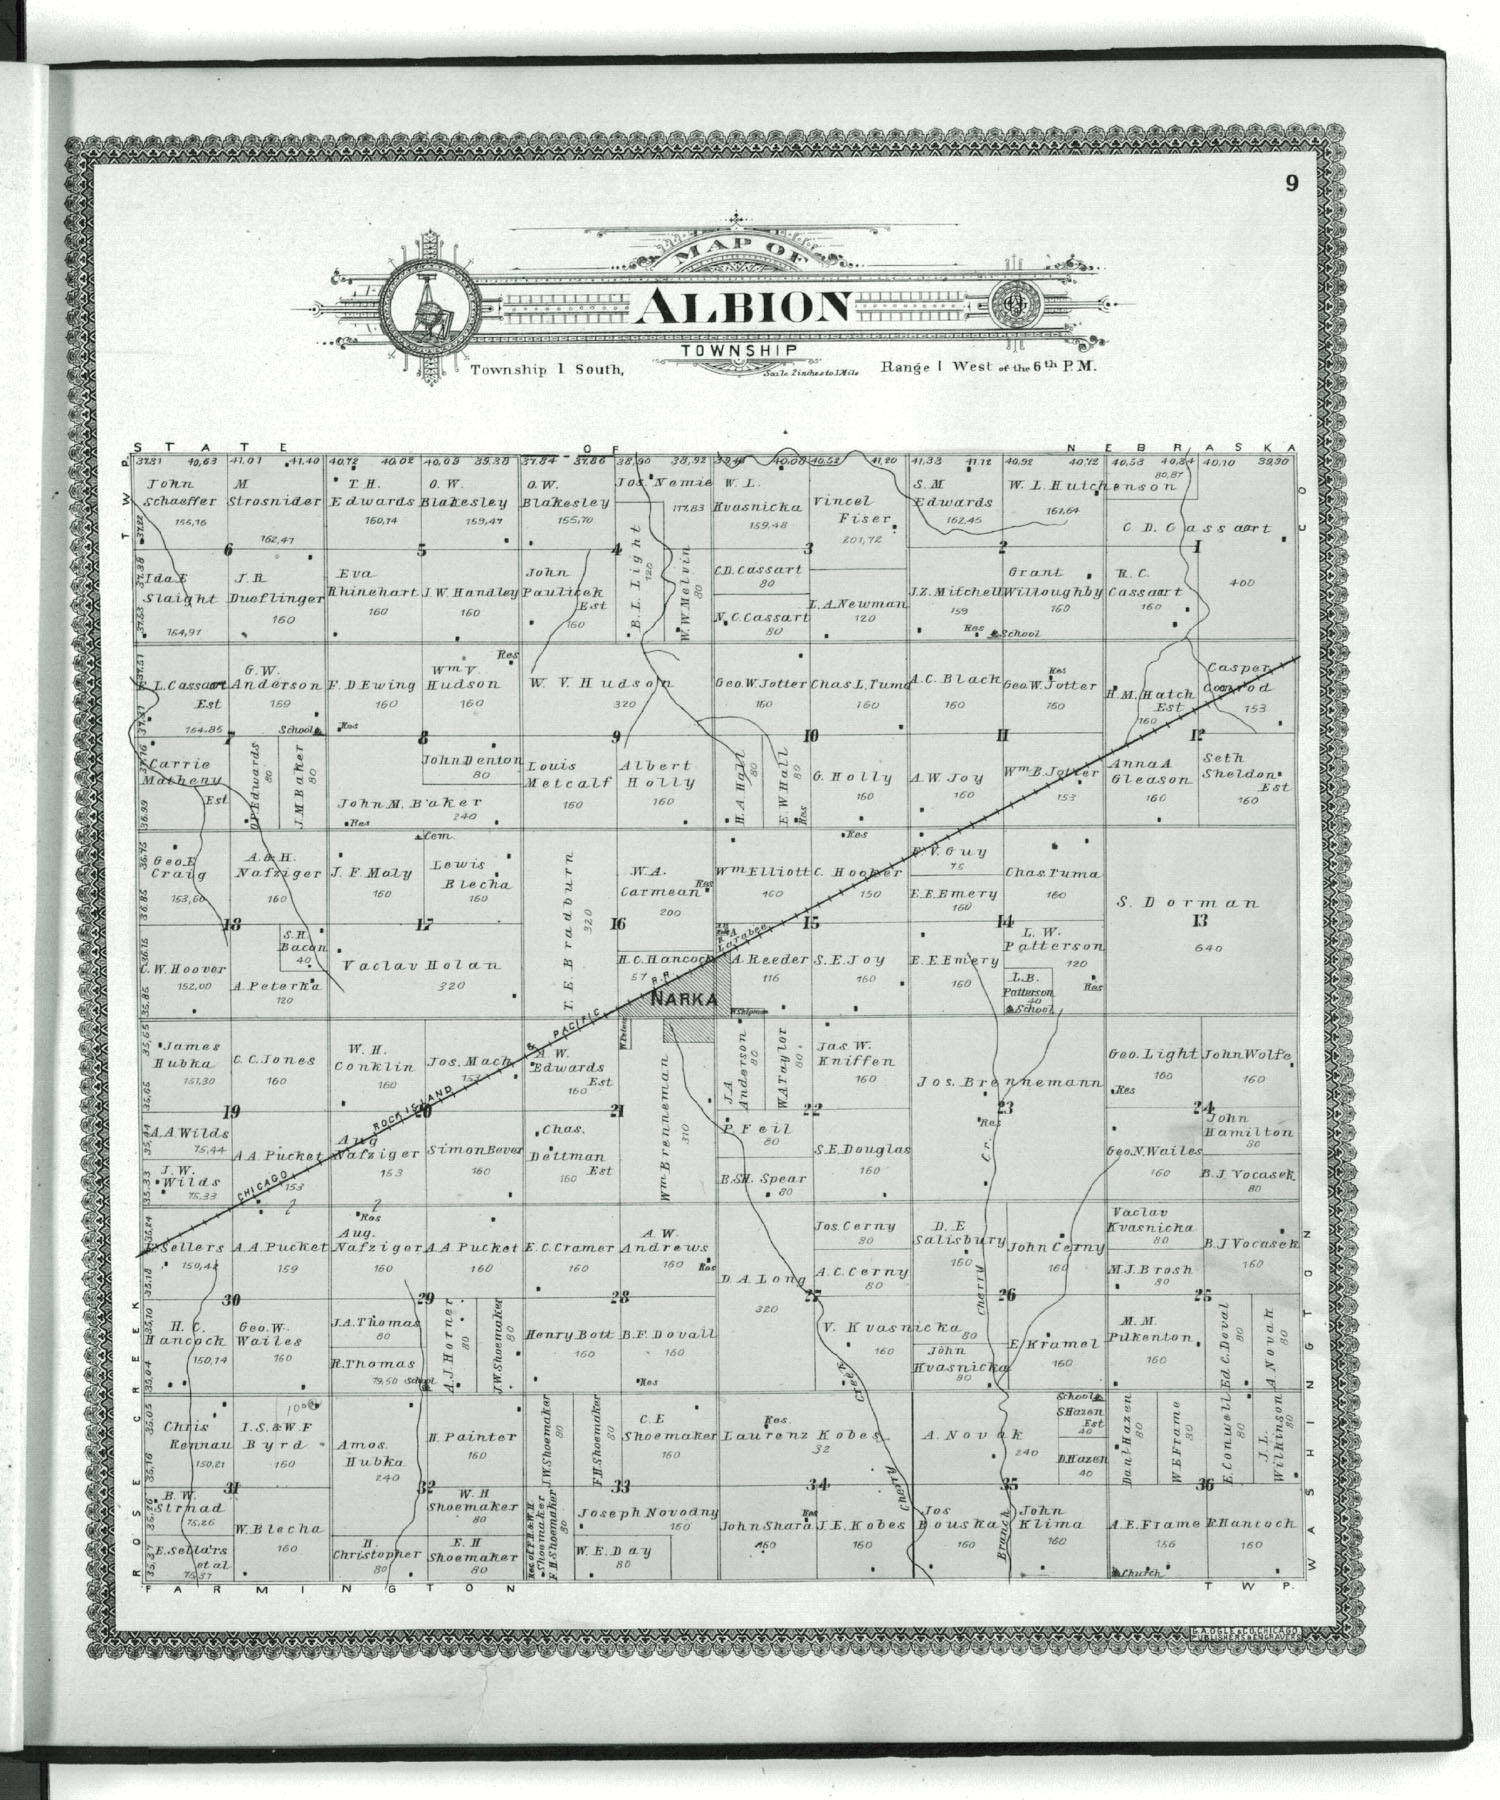 Standard atlas of Republic County, Kansas - 9